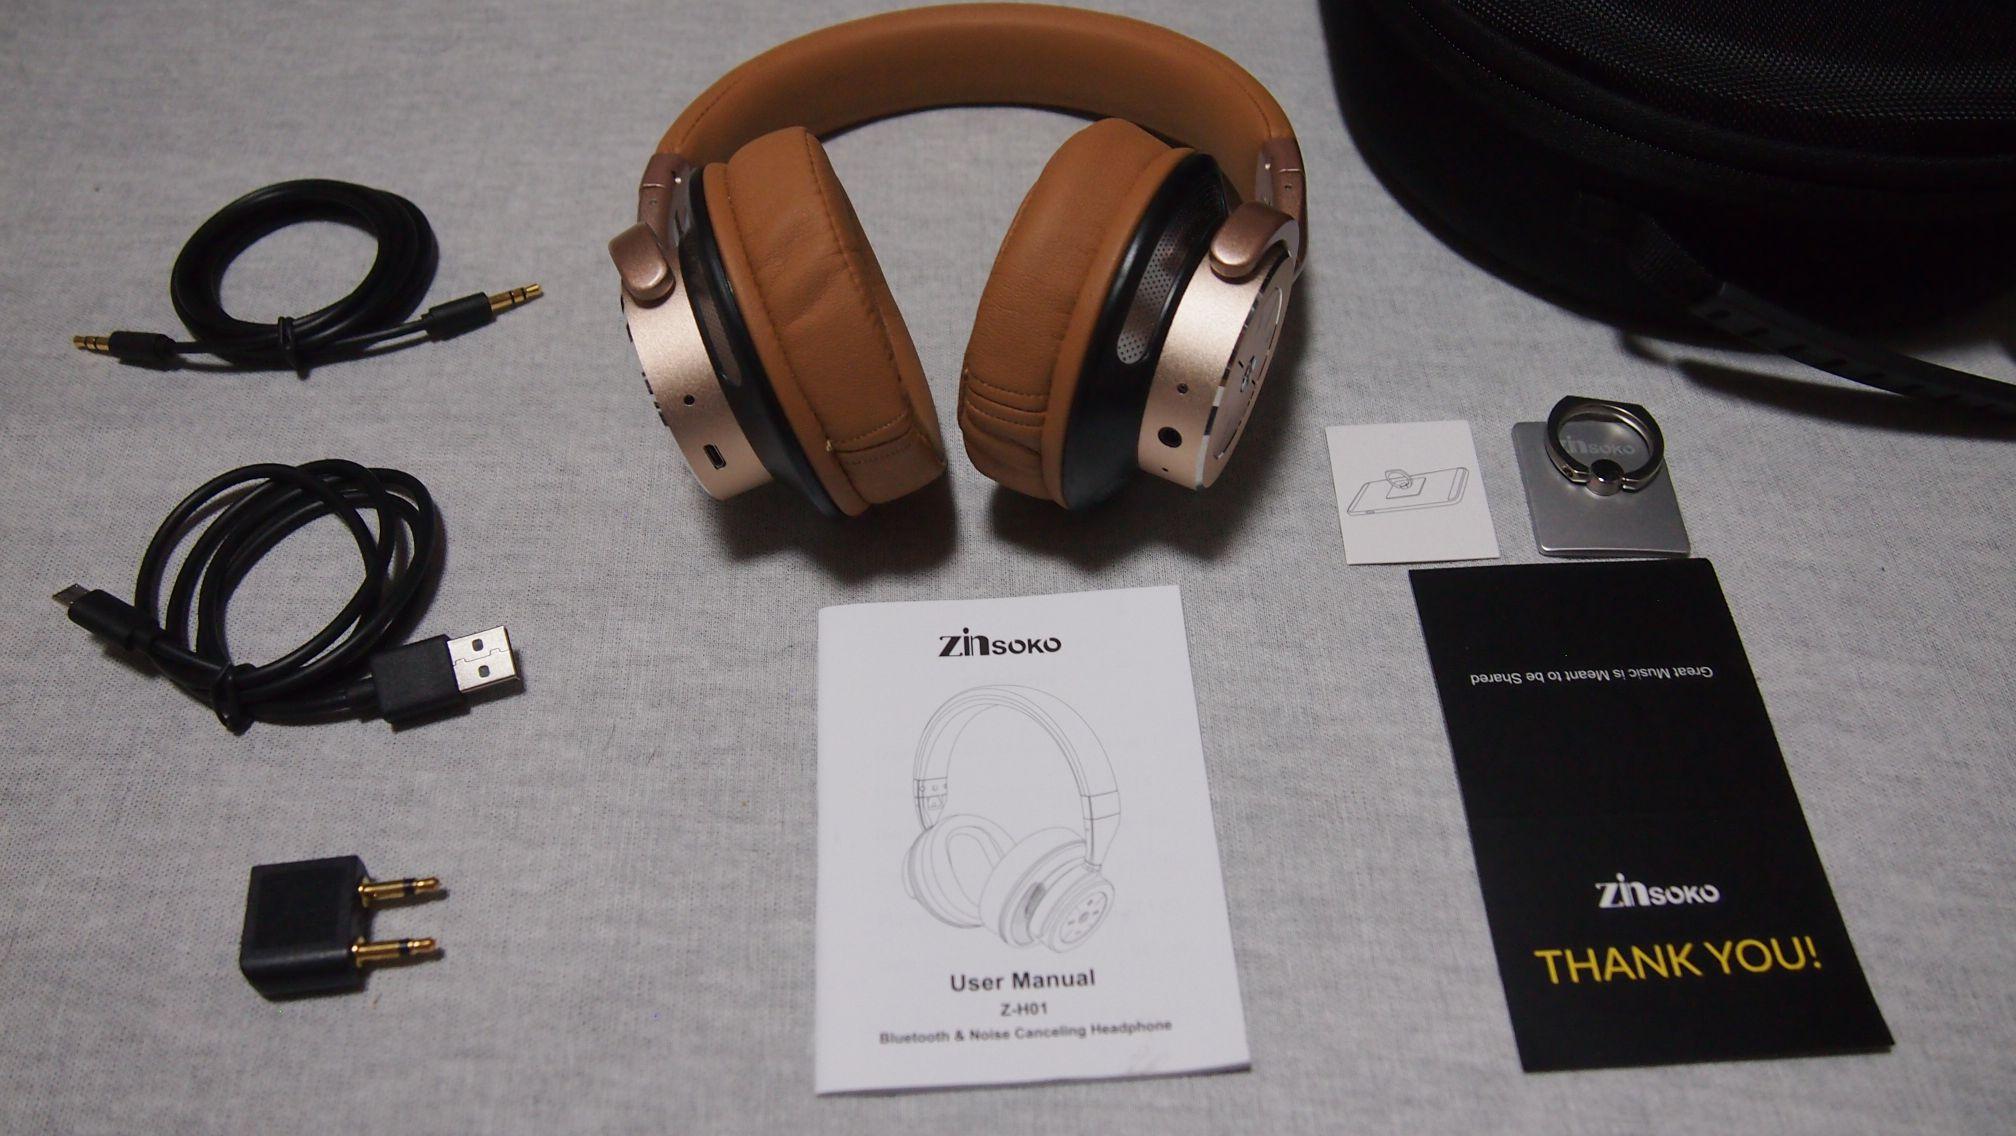 Zinsoko Z-H01 bluetoothヘッドホン 付属品